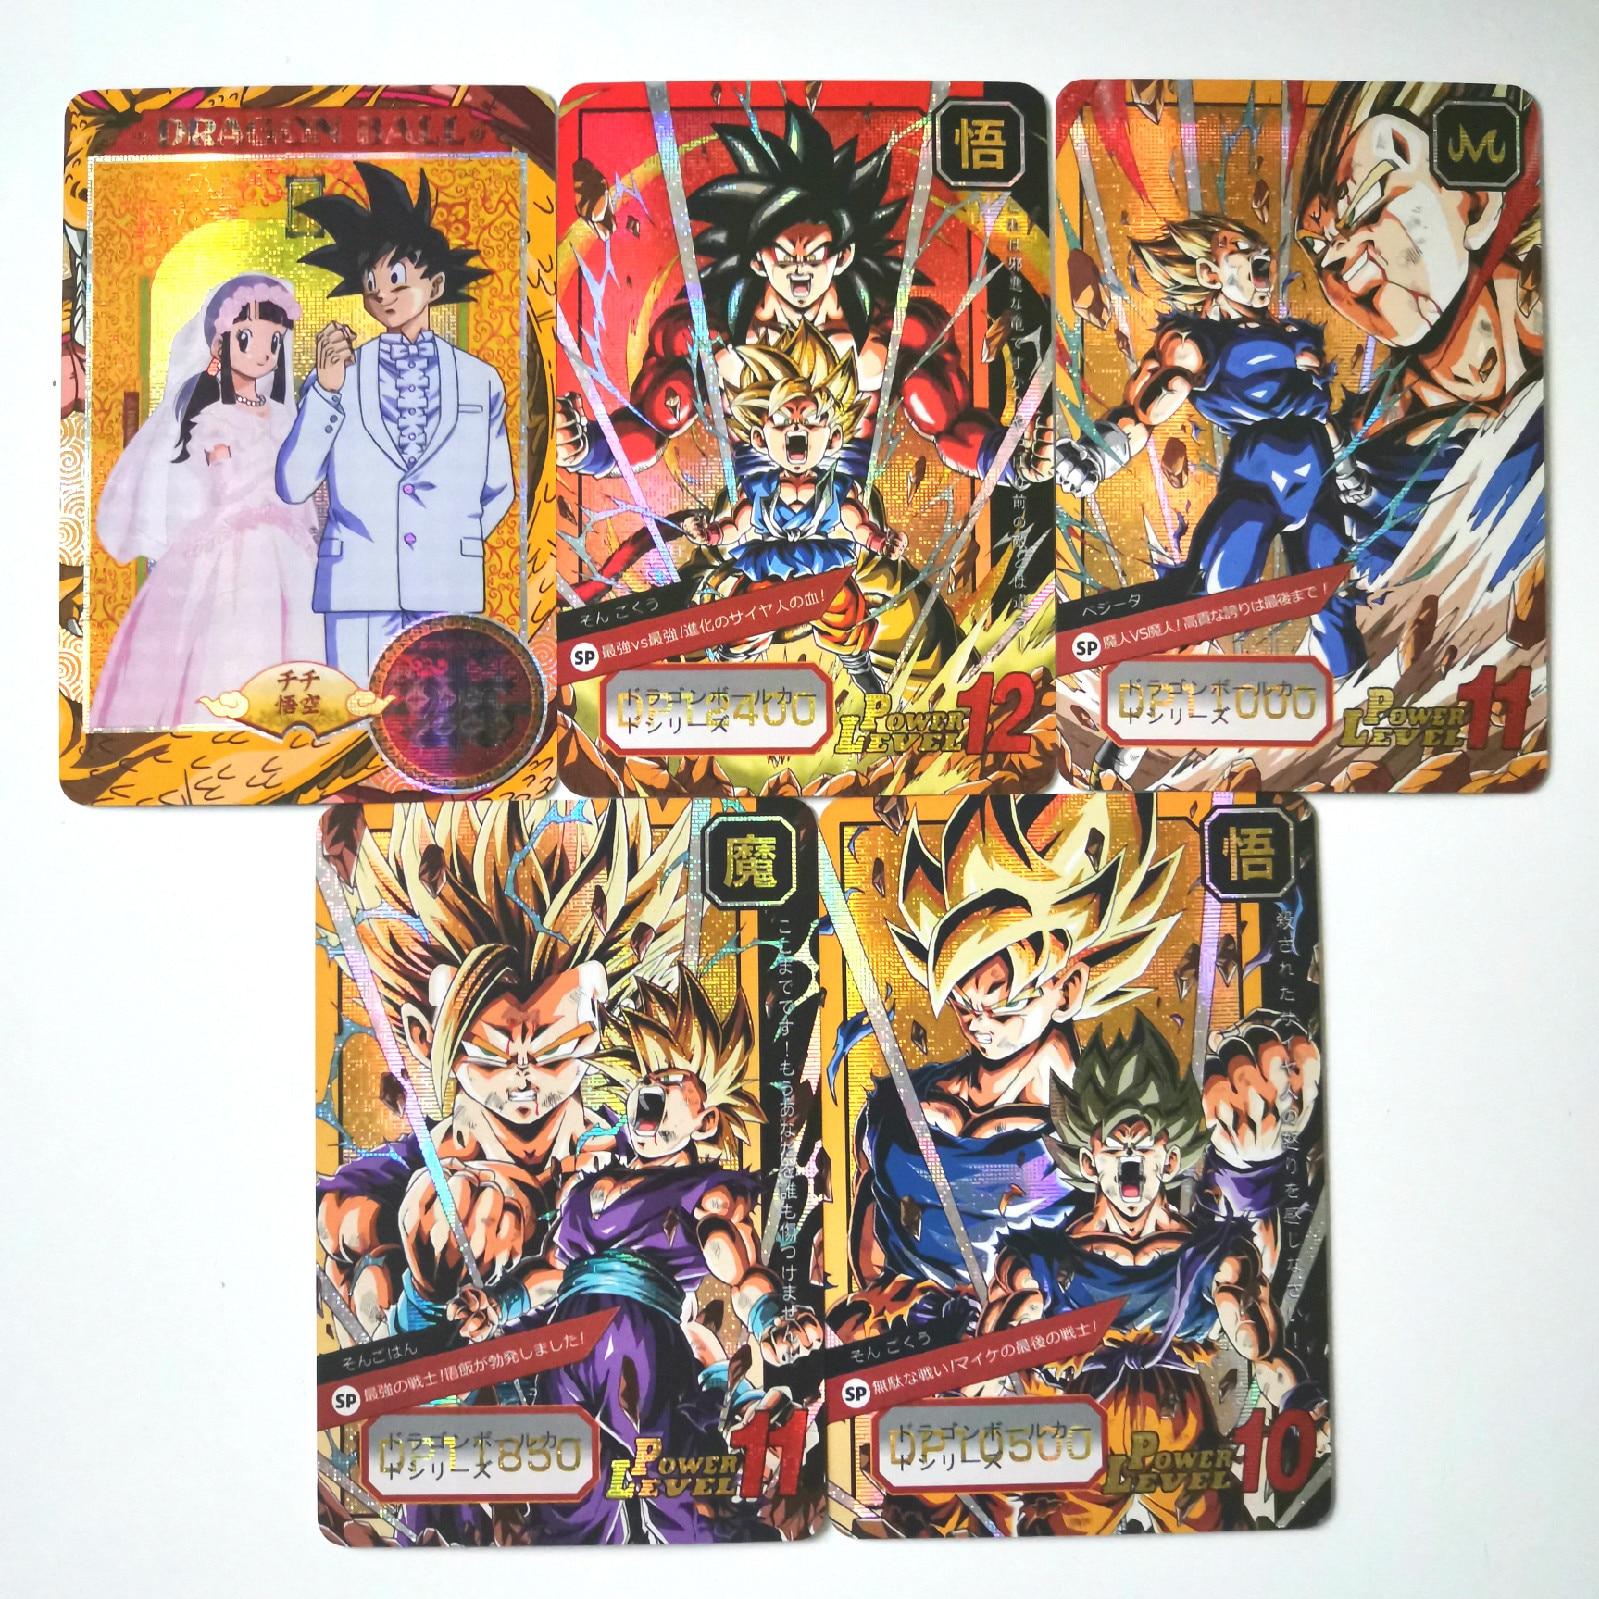 50pcs Super Dragon Ball Heroes Battle Card Goku Bulma Master Roshi Dragon Ball Super Game Collection Anime Cards